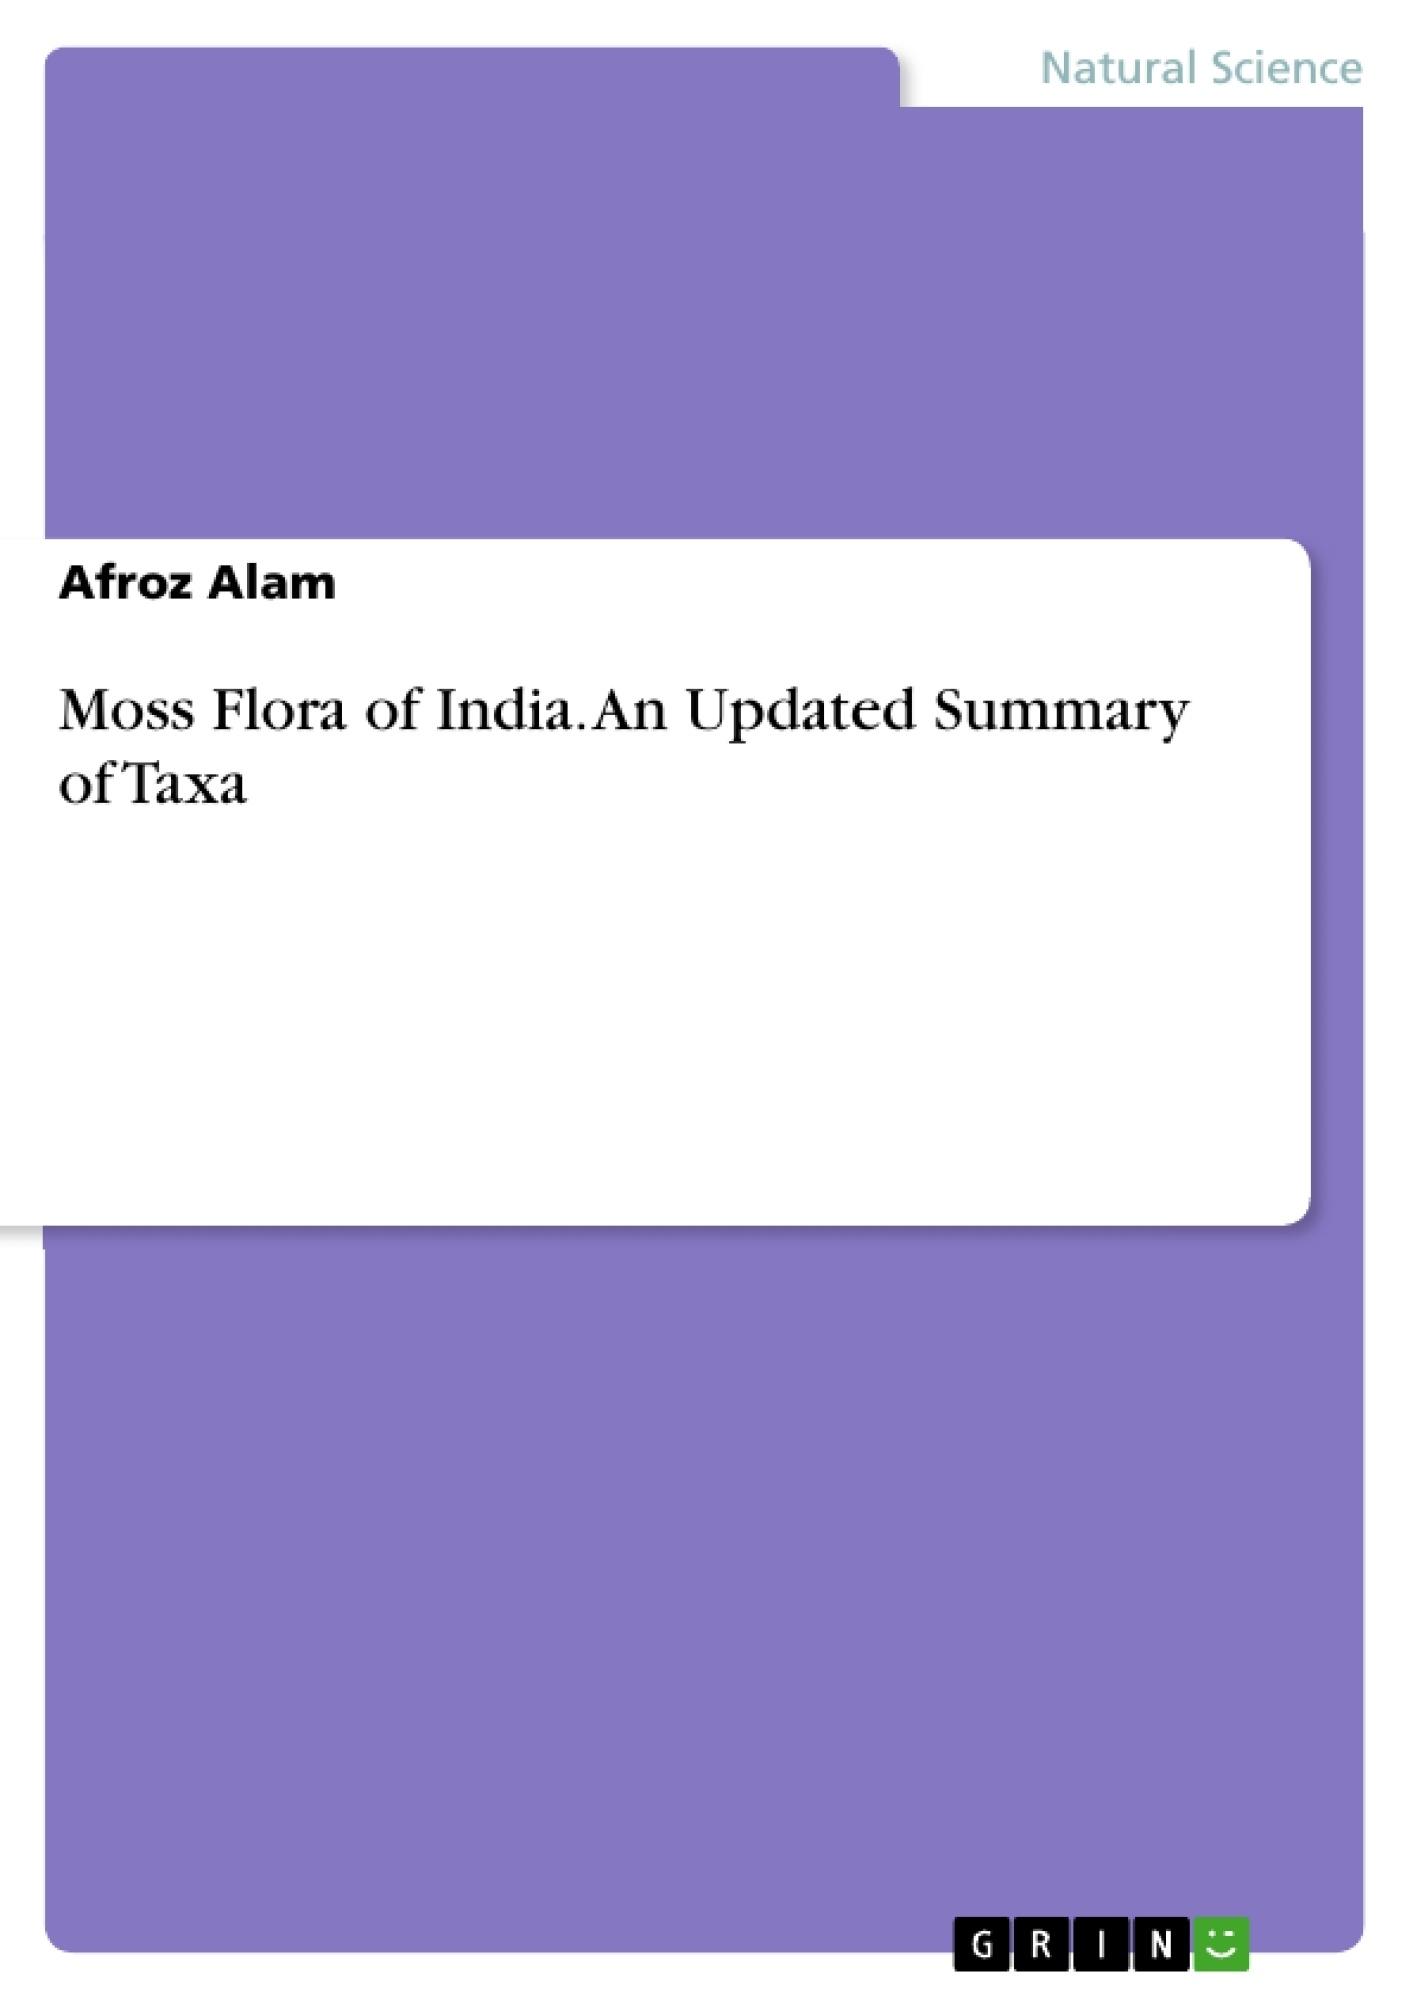 Title: Moss Flora of India. An Updated Summary of Taxa